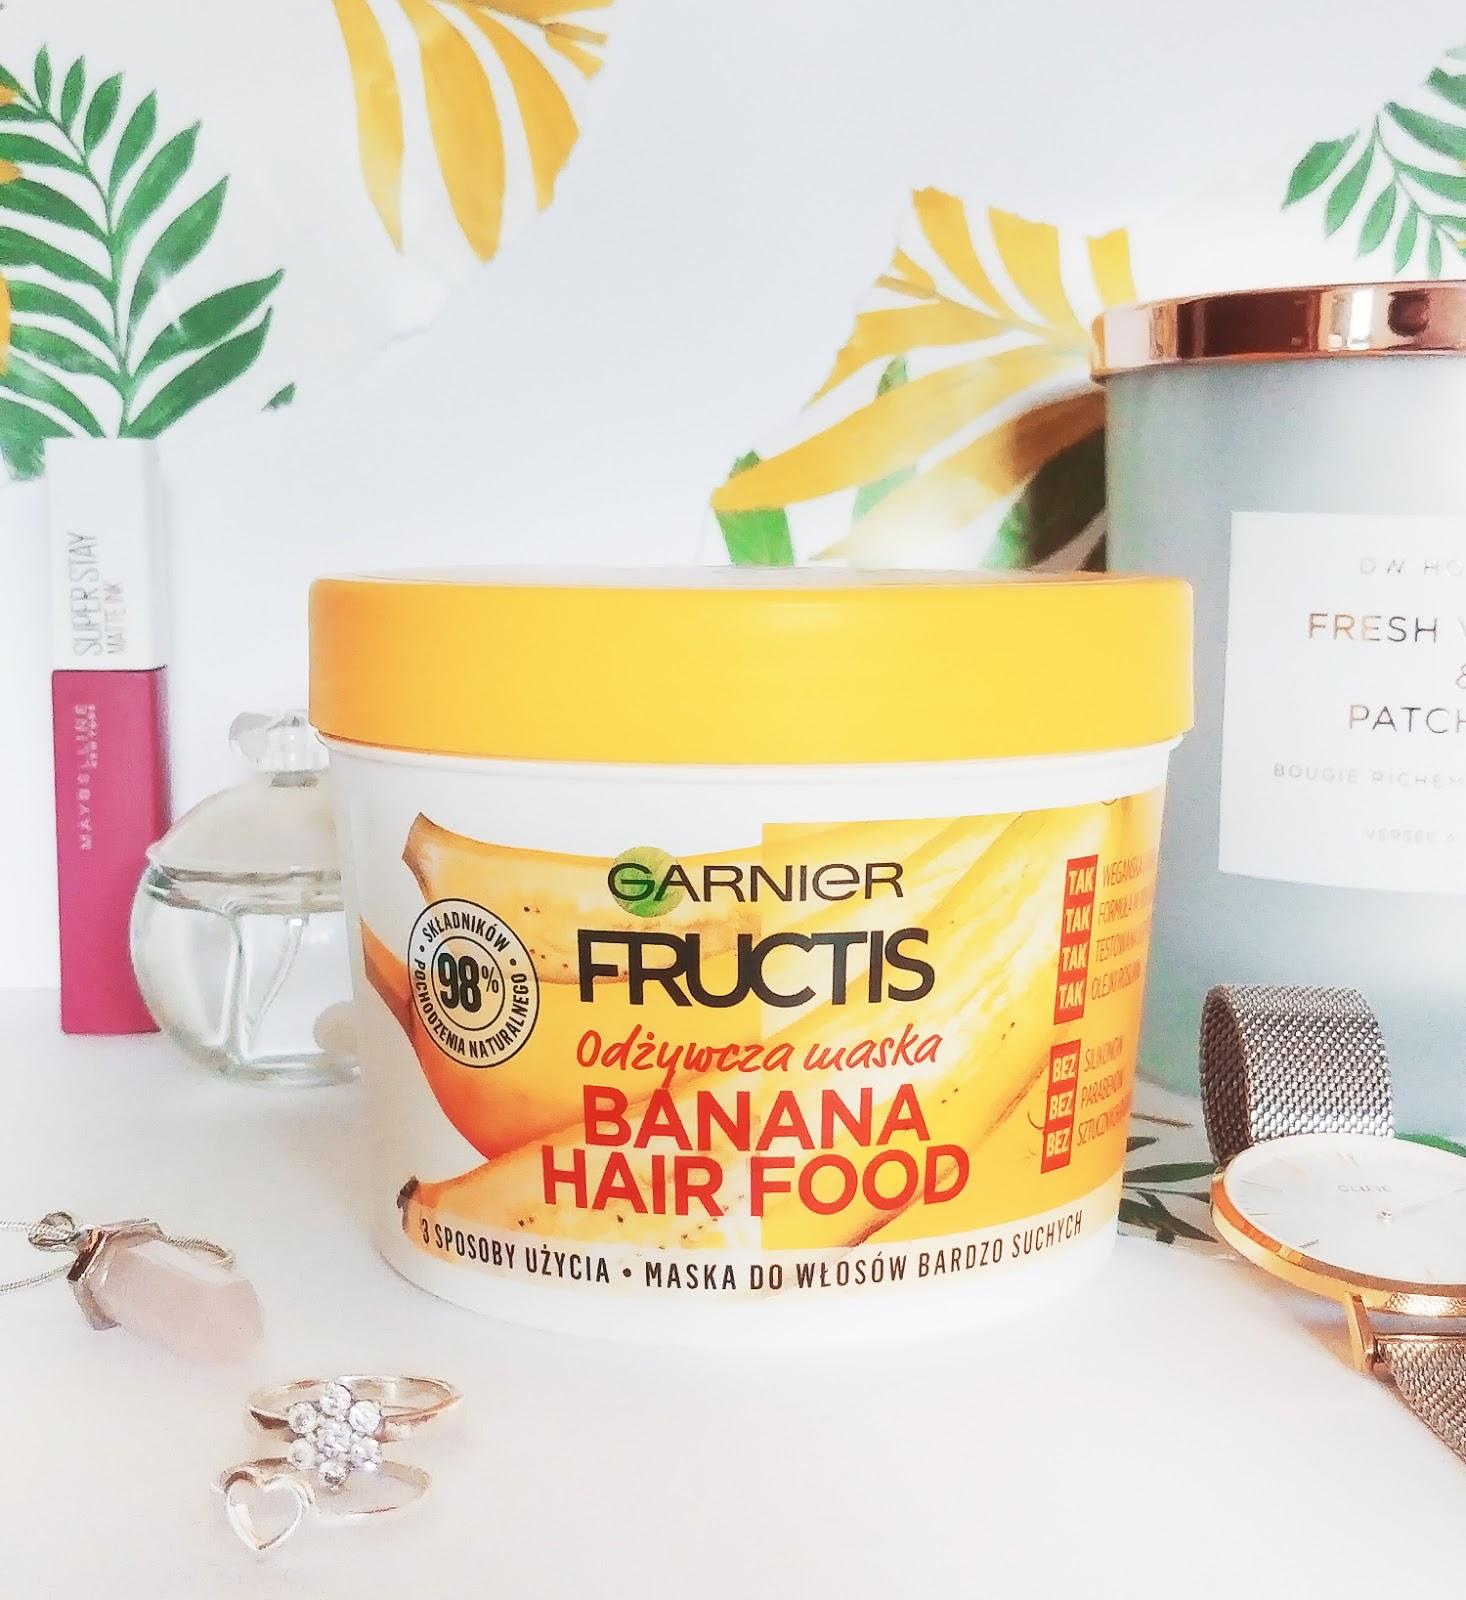 Garnier Fructis odżywcza maska Banana Hair Food